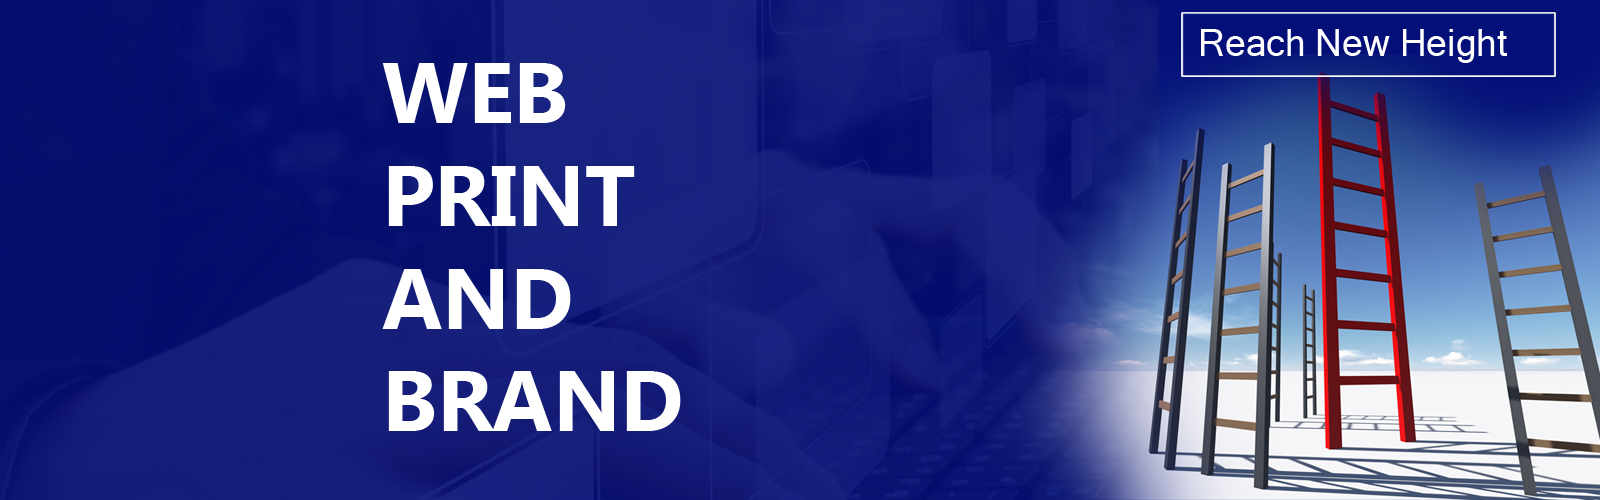 web print brand seo Marketing digital agency toronto